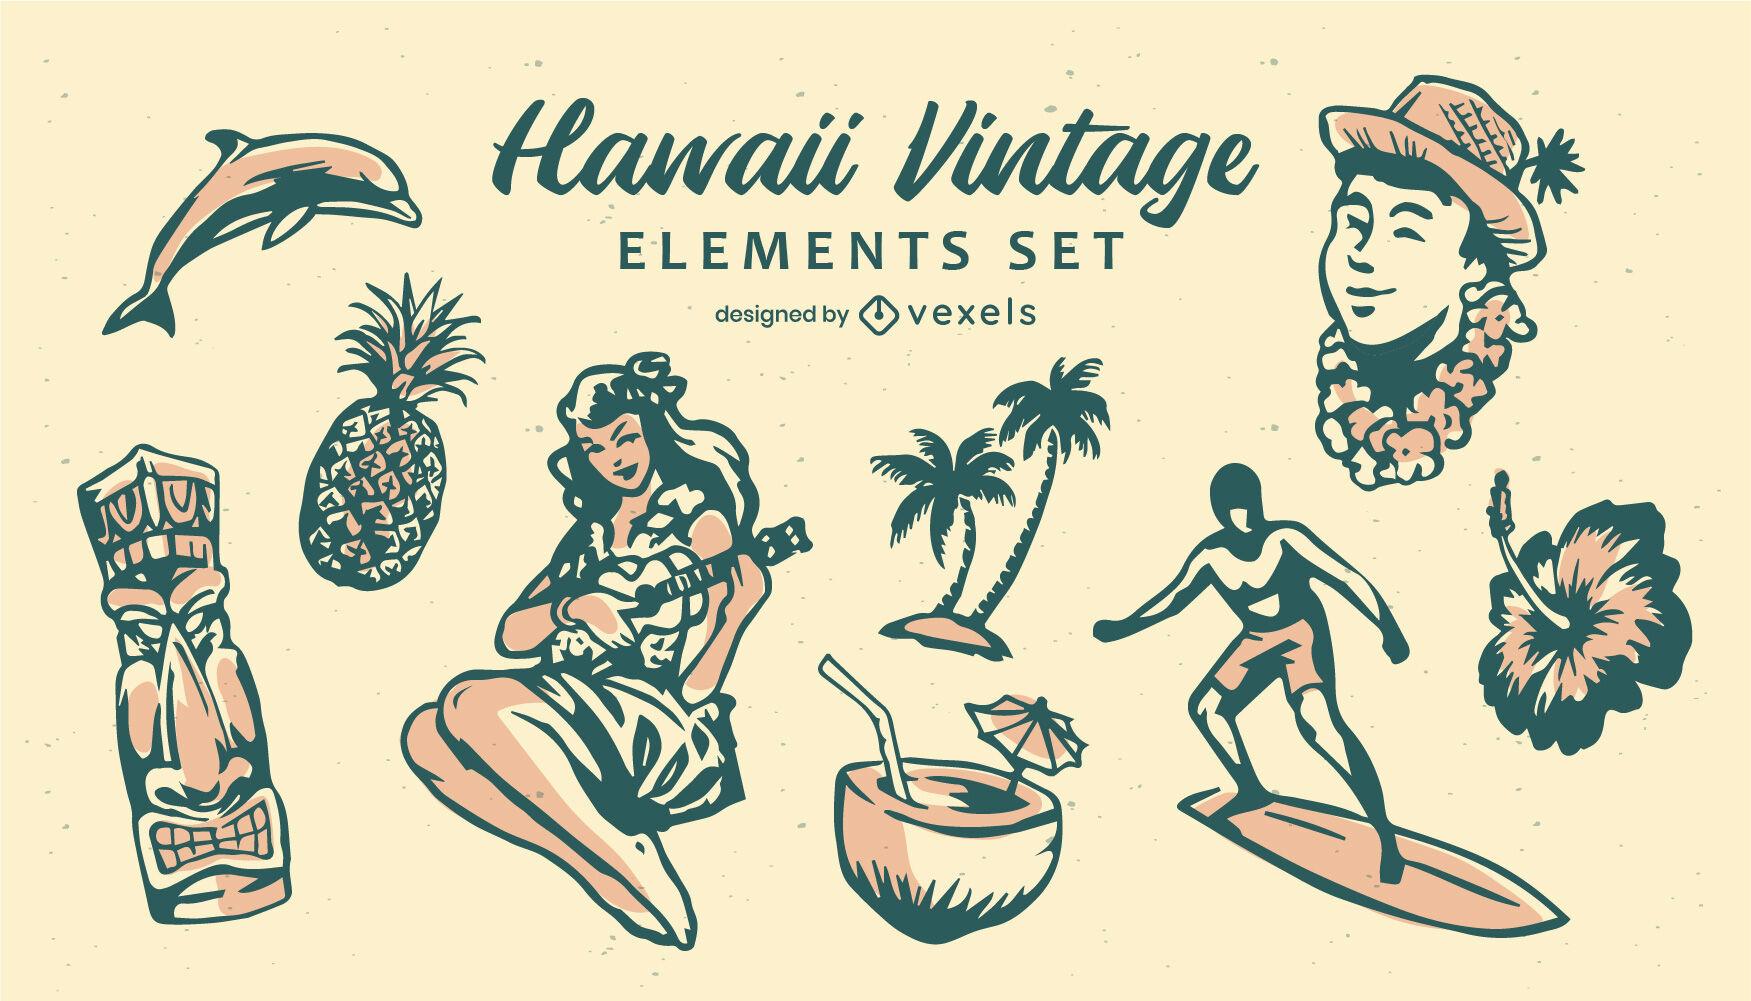 Hawaii vintage elements set